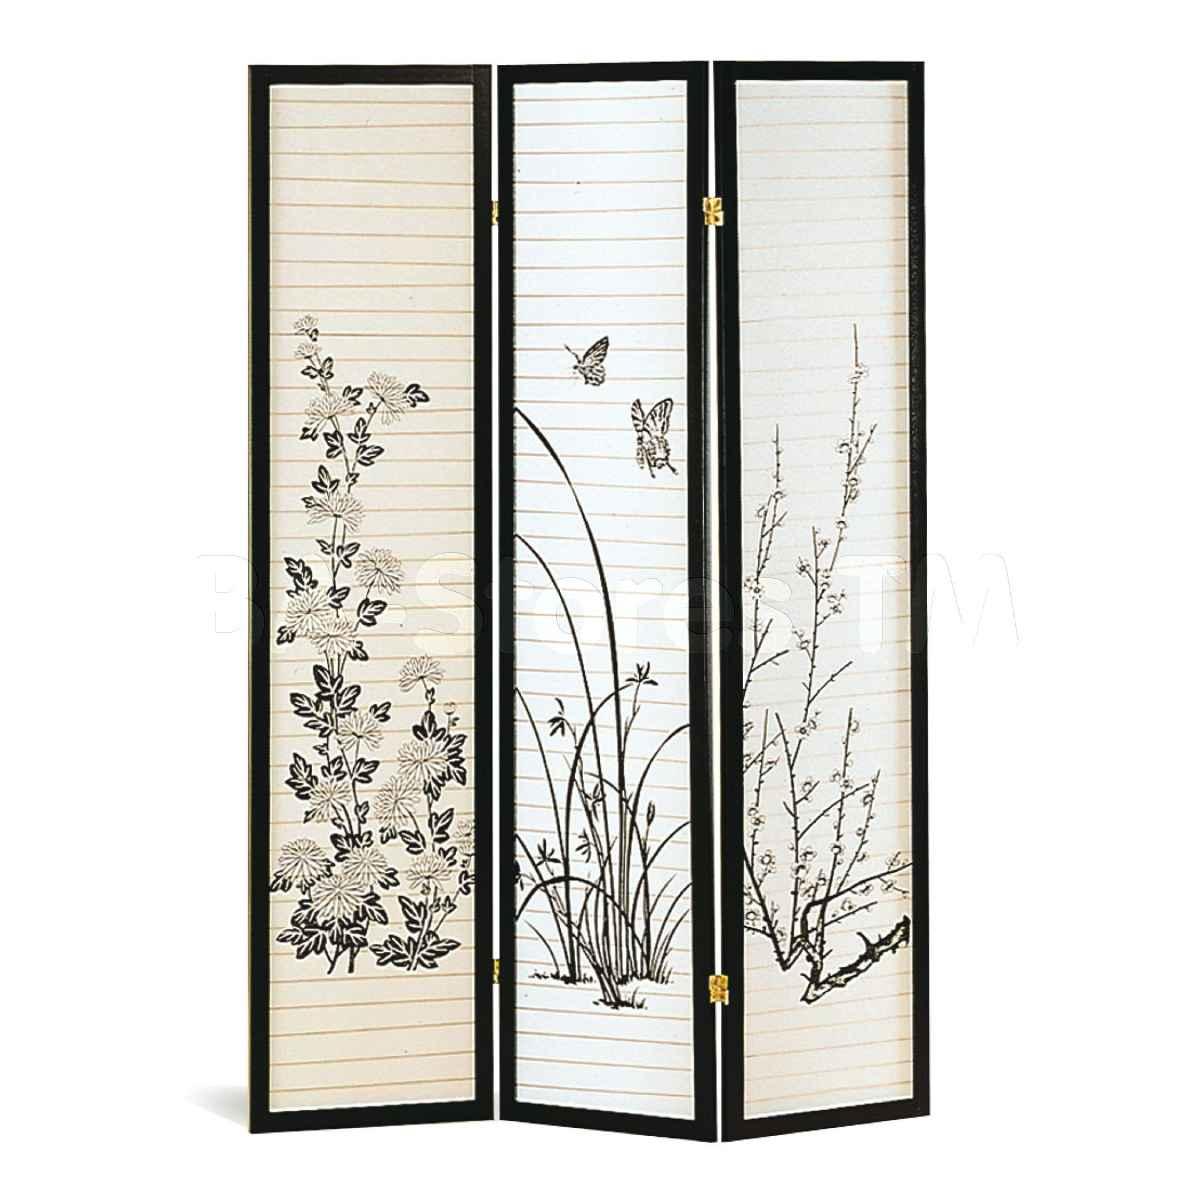 Coaster Folding Bamboo Screen Divider